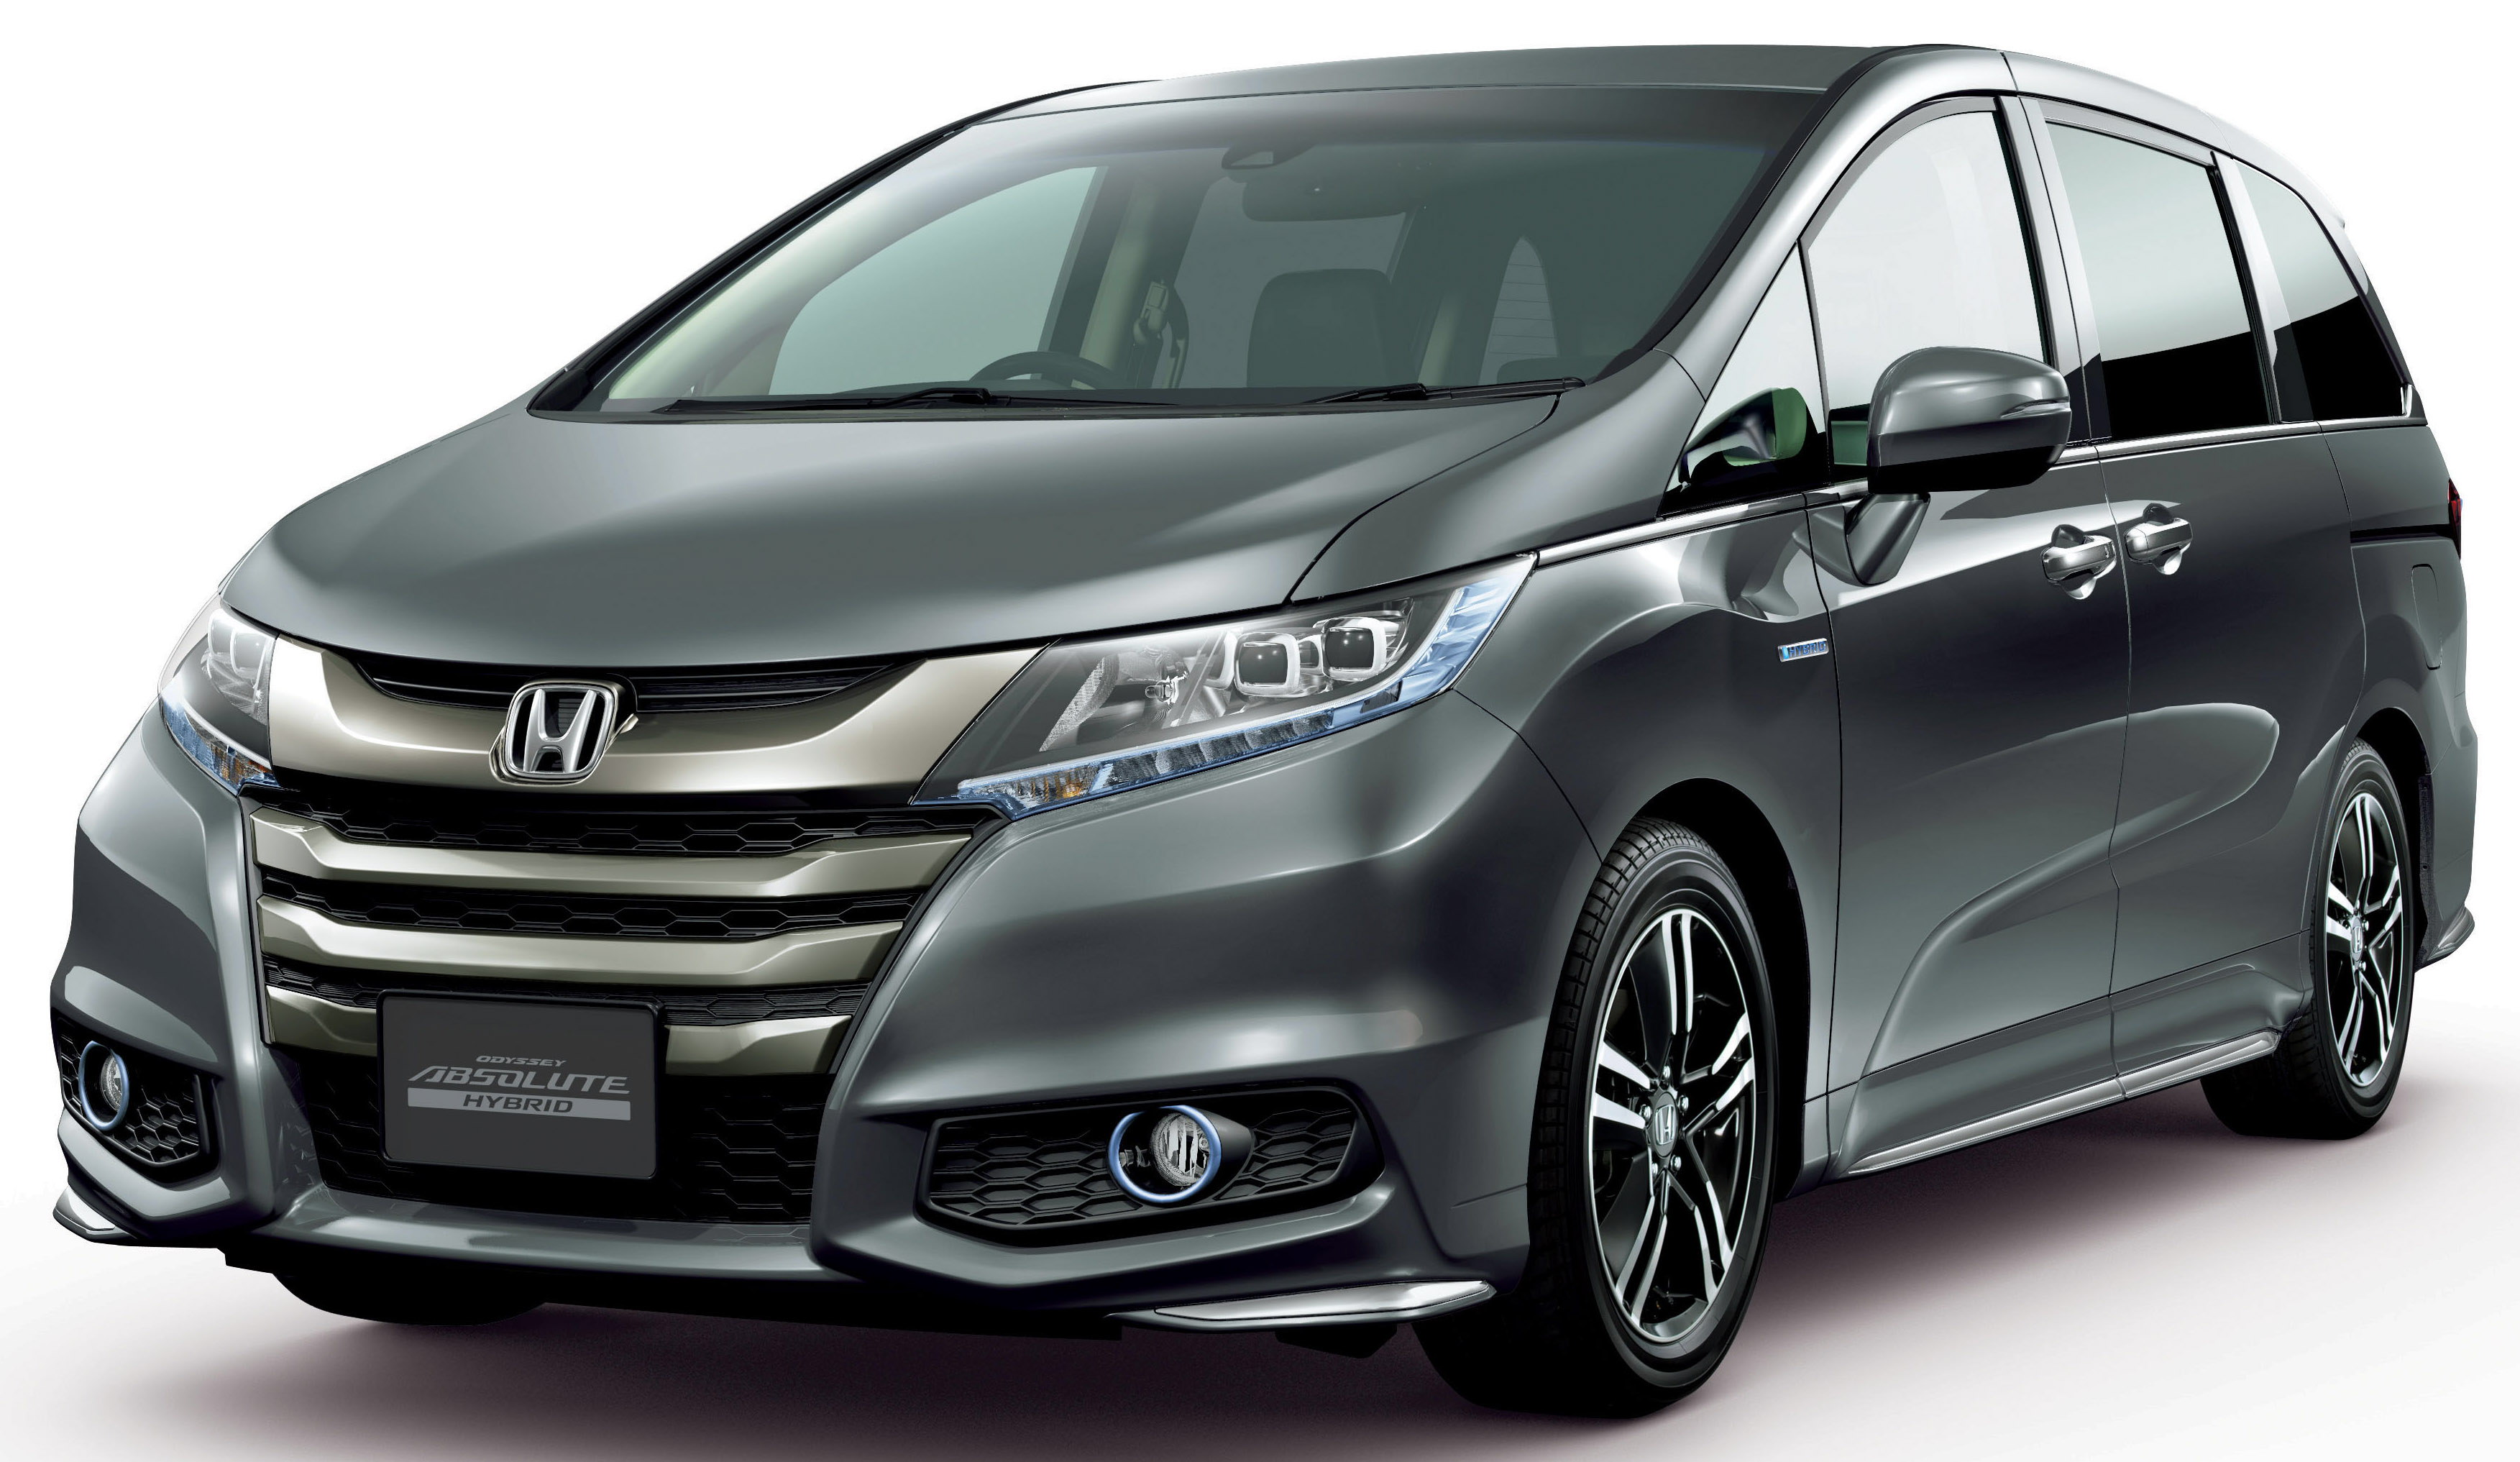 Bob Hall Honda 2020 New Car Reviews Models Magic Mobility X8 Wiring Diagram Odyssey Next Refresh Autos Post